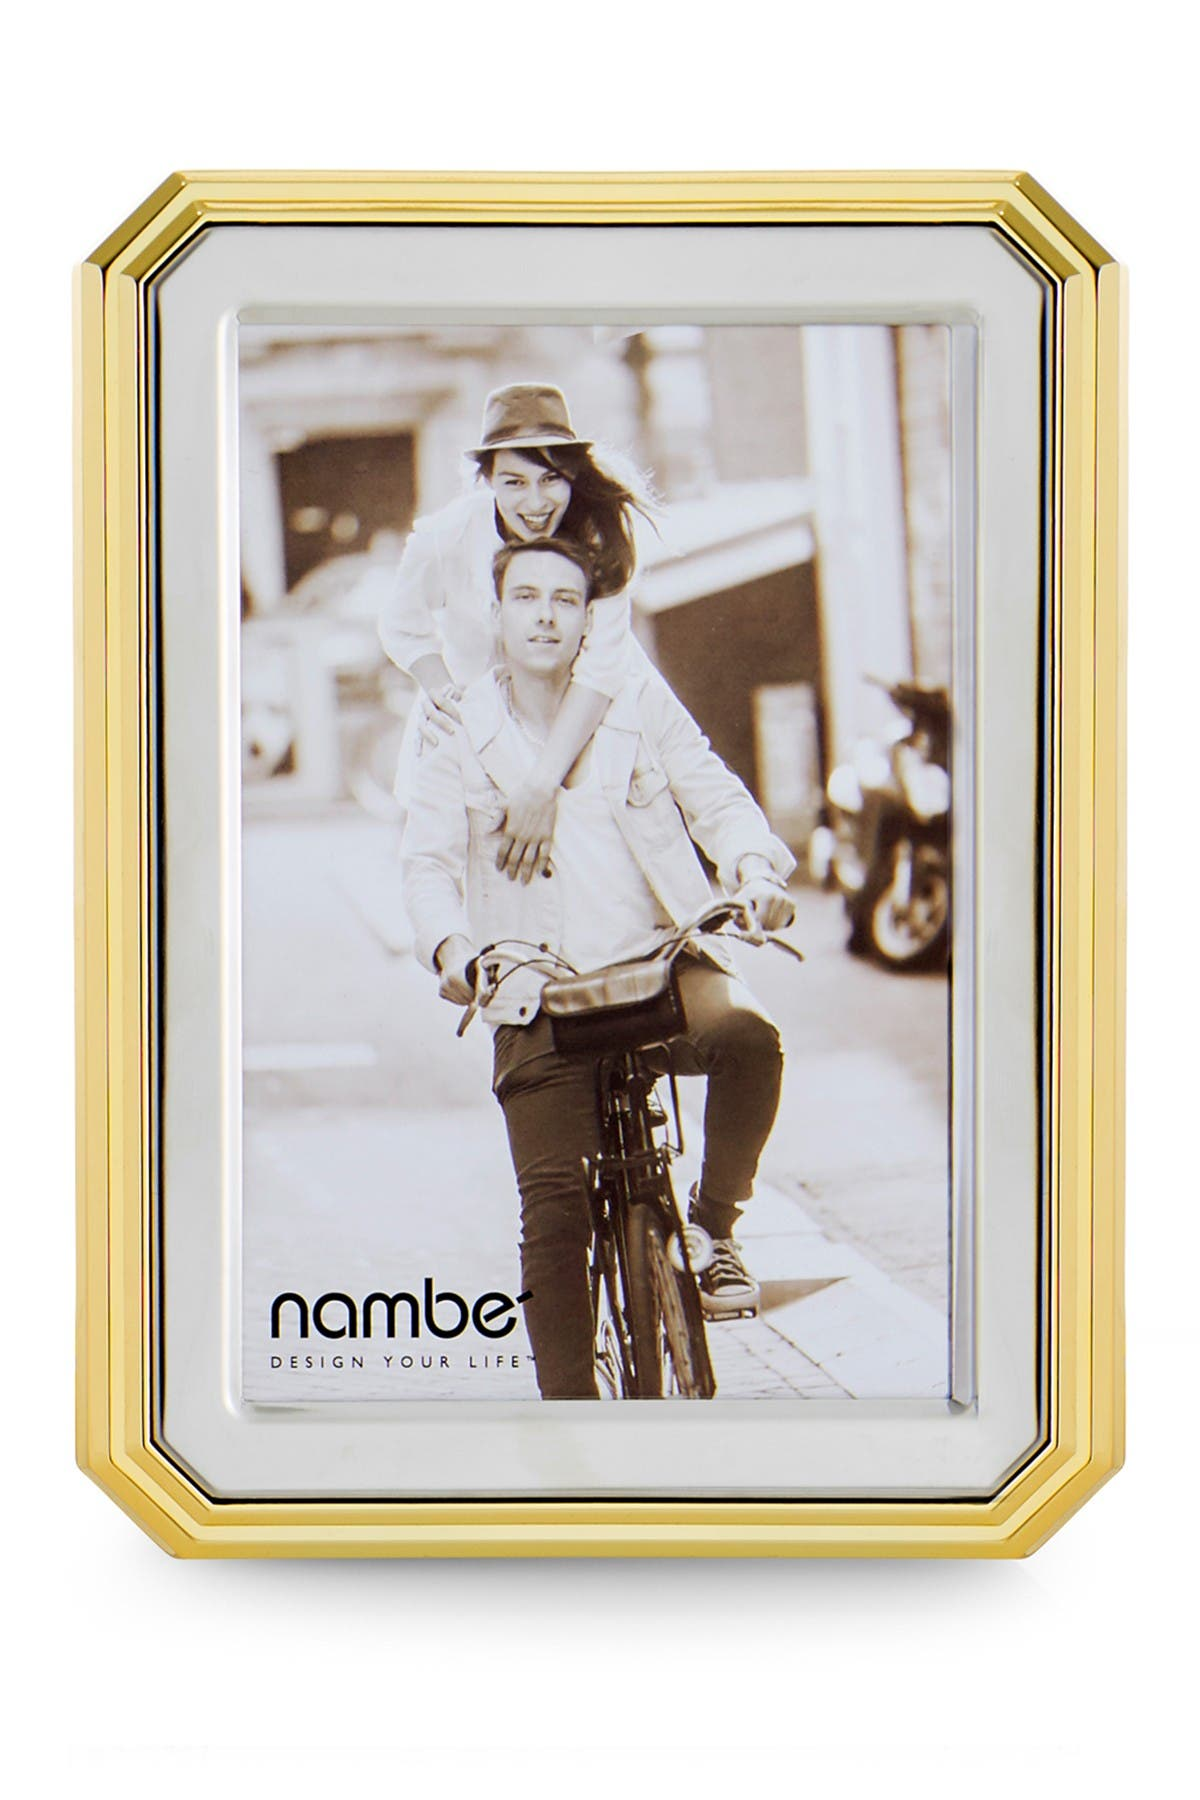 Image of Nambe Gleason Photo Frame, 4x6